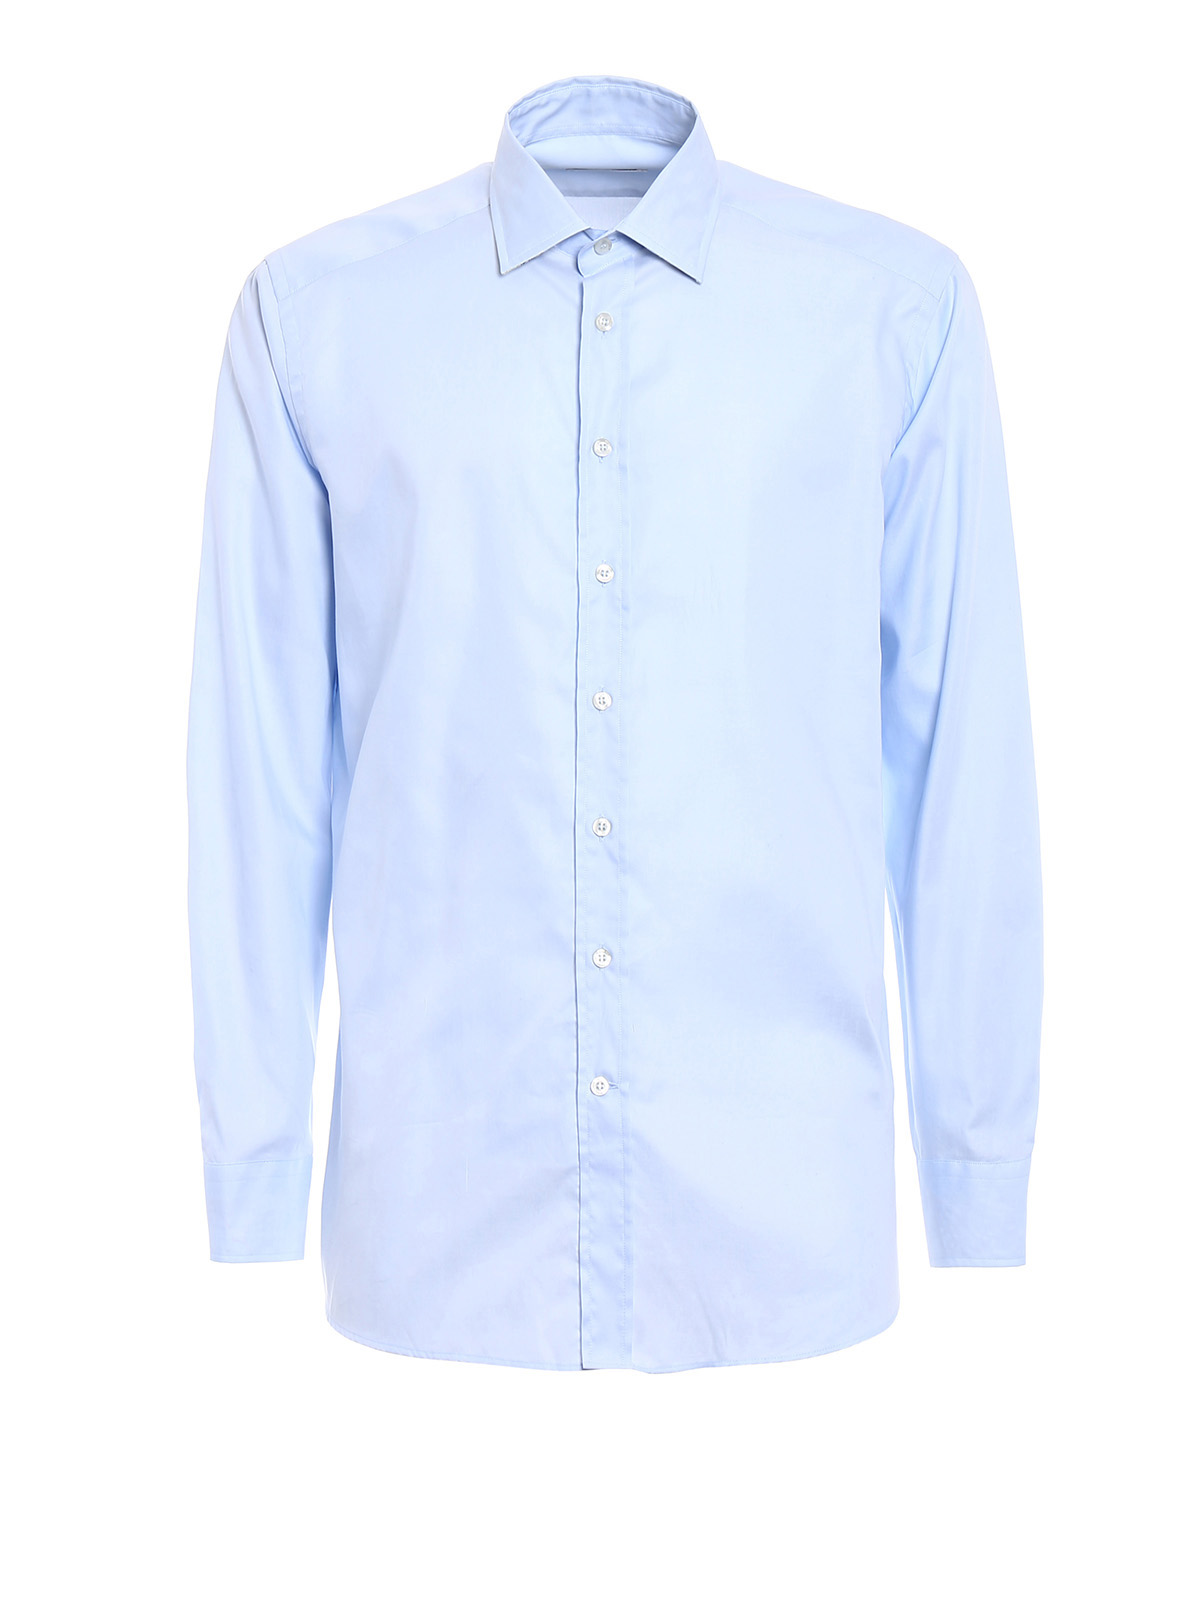 Cotton poplin shirt by etro shirts ikrix for What is a poplin shirt